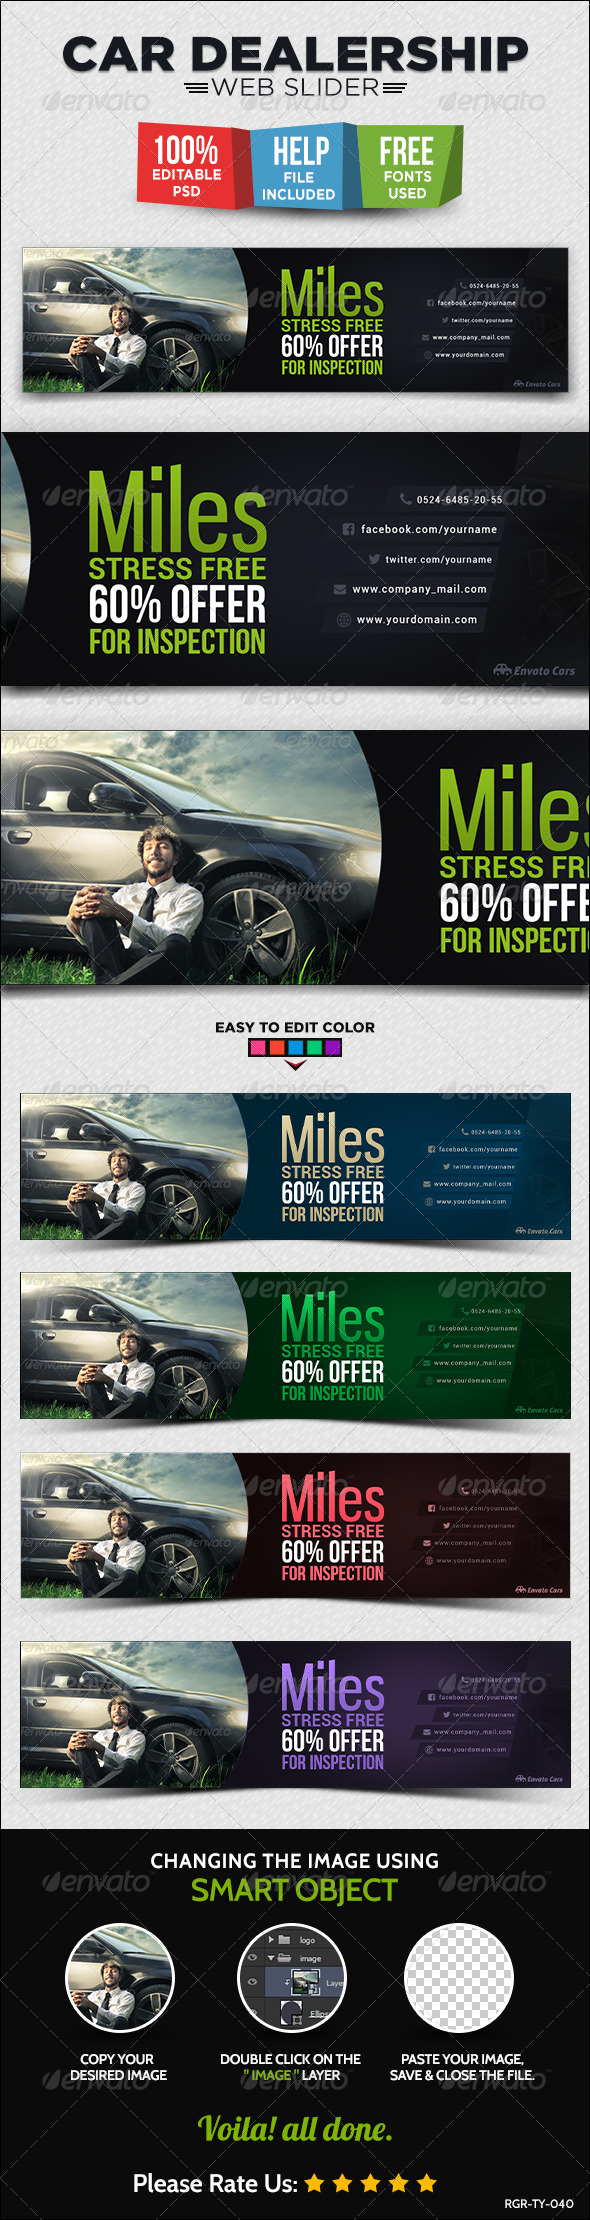 Automotive Car Dealership Graphics Designs Templates